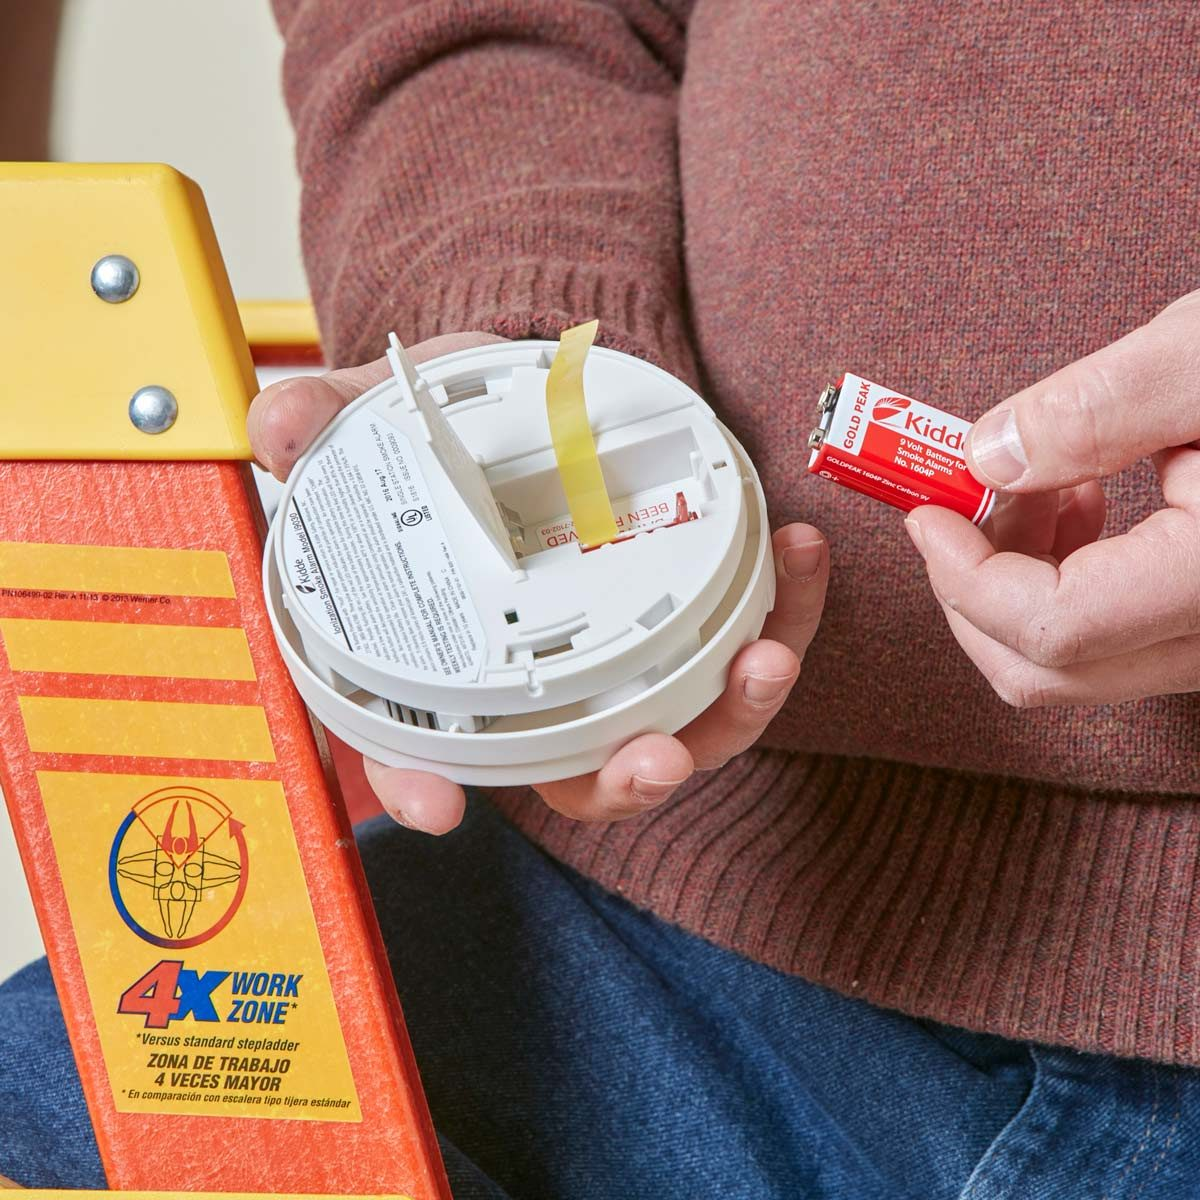 Chirping Smoke Detectors